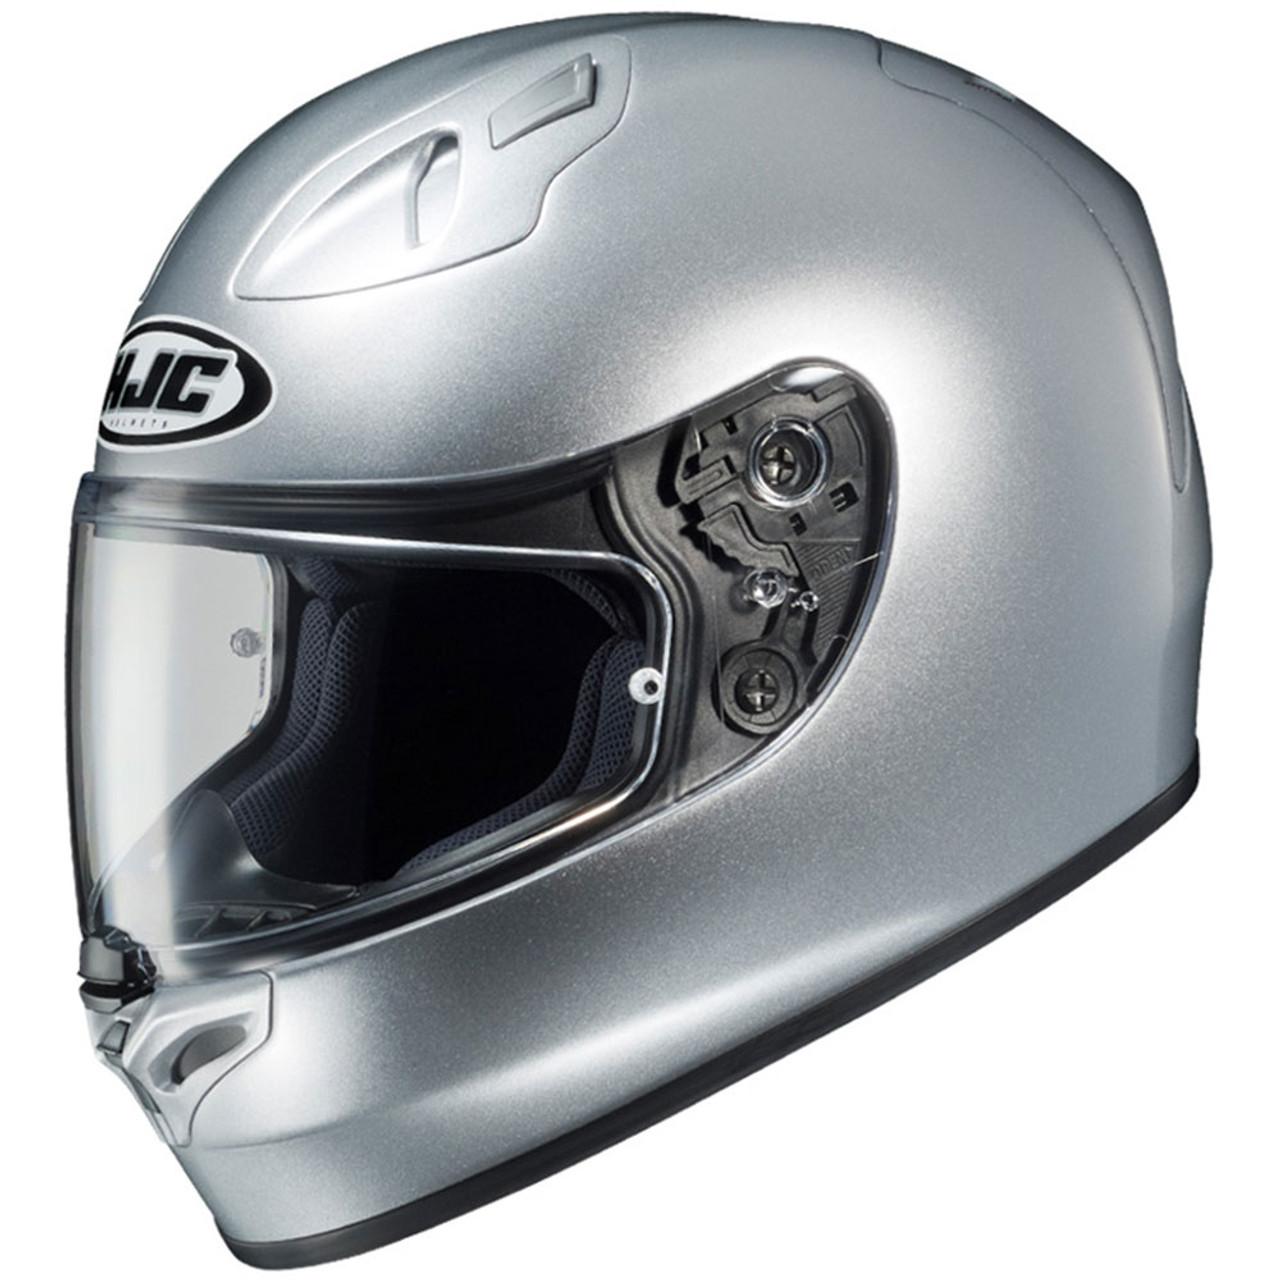 Hjc Fg 17 >> Hjc Fg 17 Motorcycle Helmet Metallic Silver Get Lowered Cycles